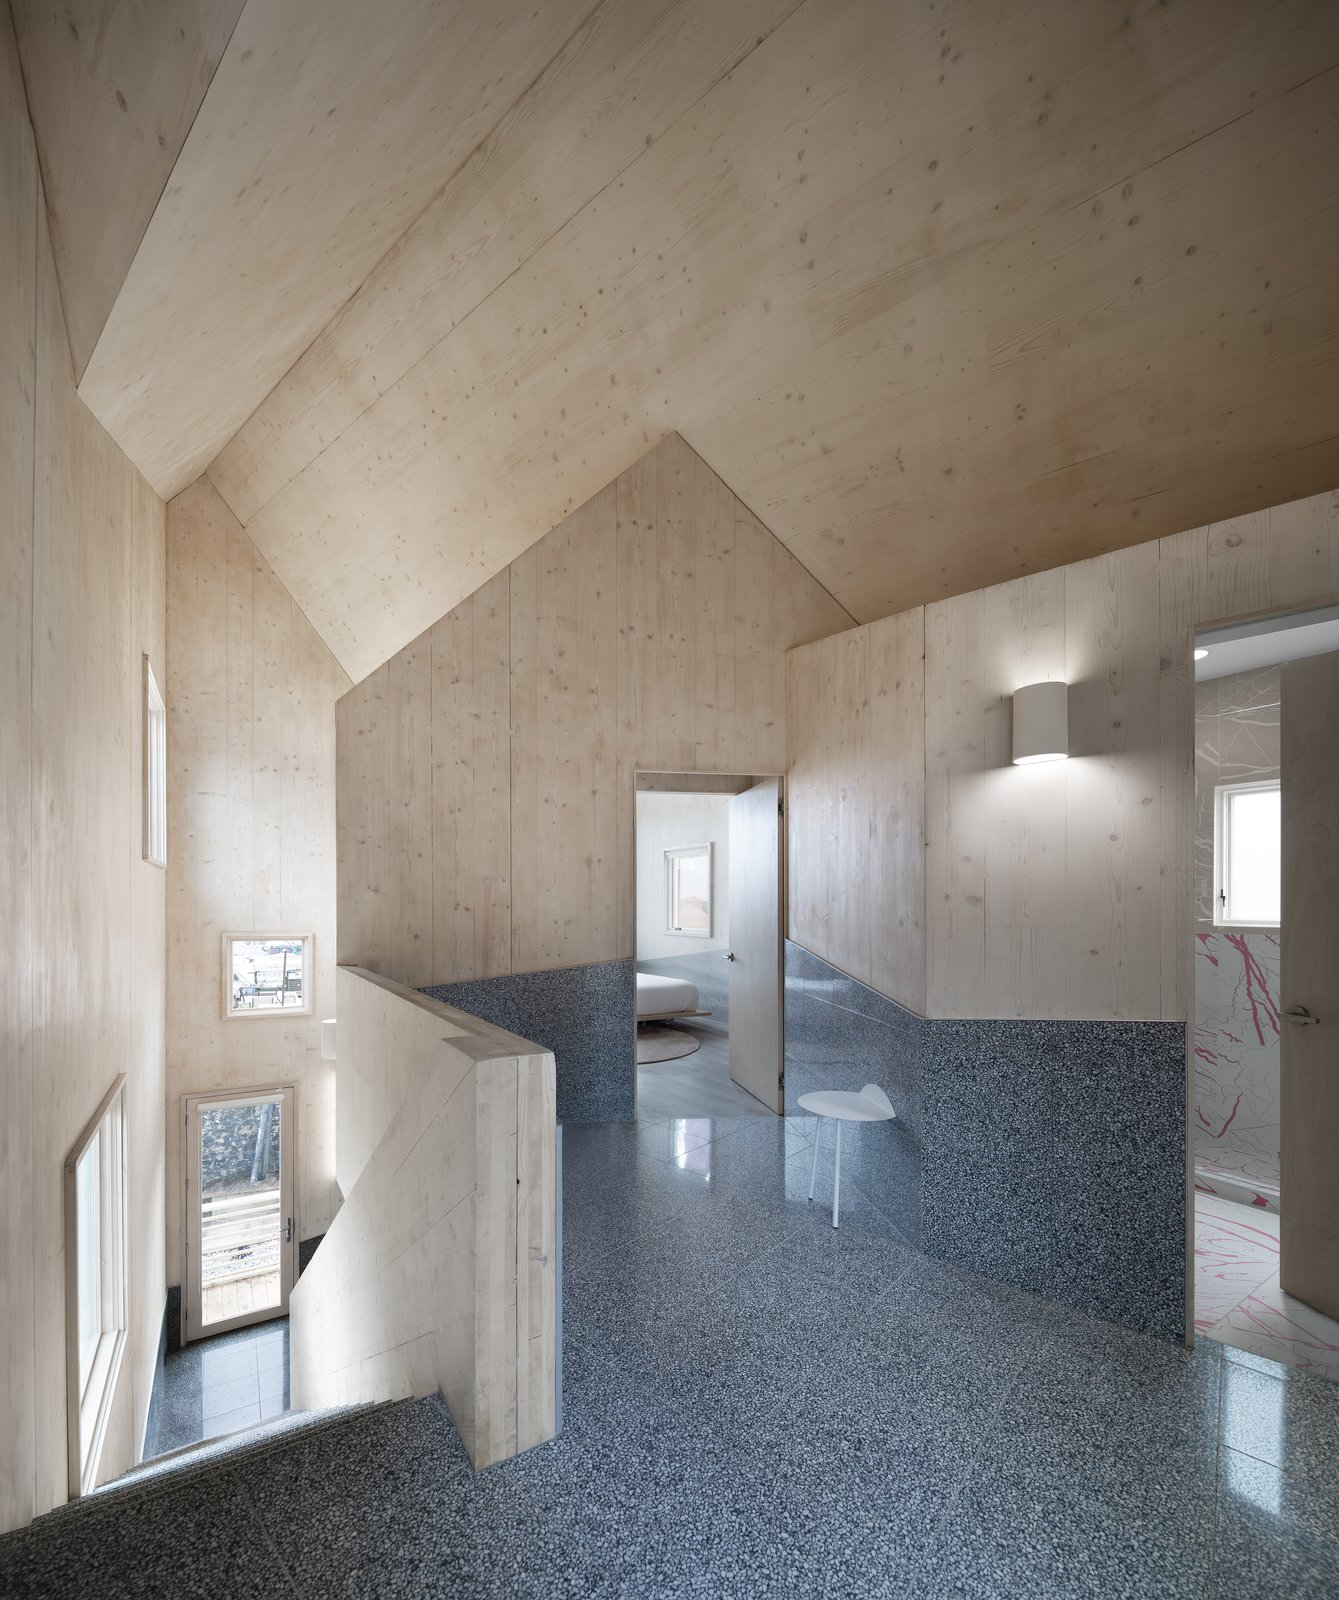 Haus Gables gable roof interior